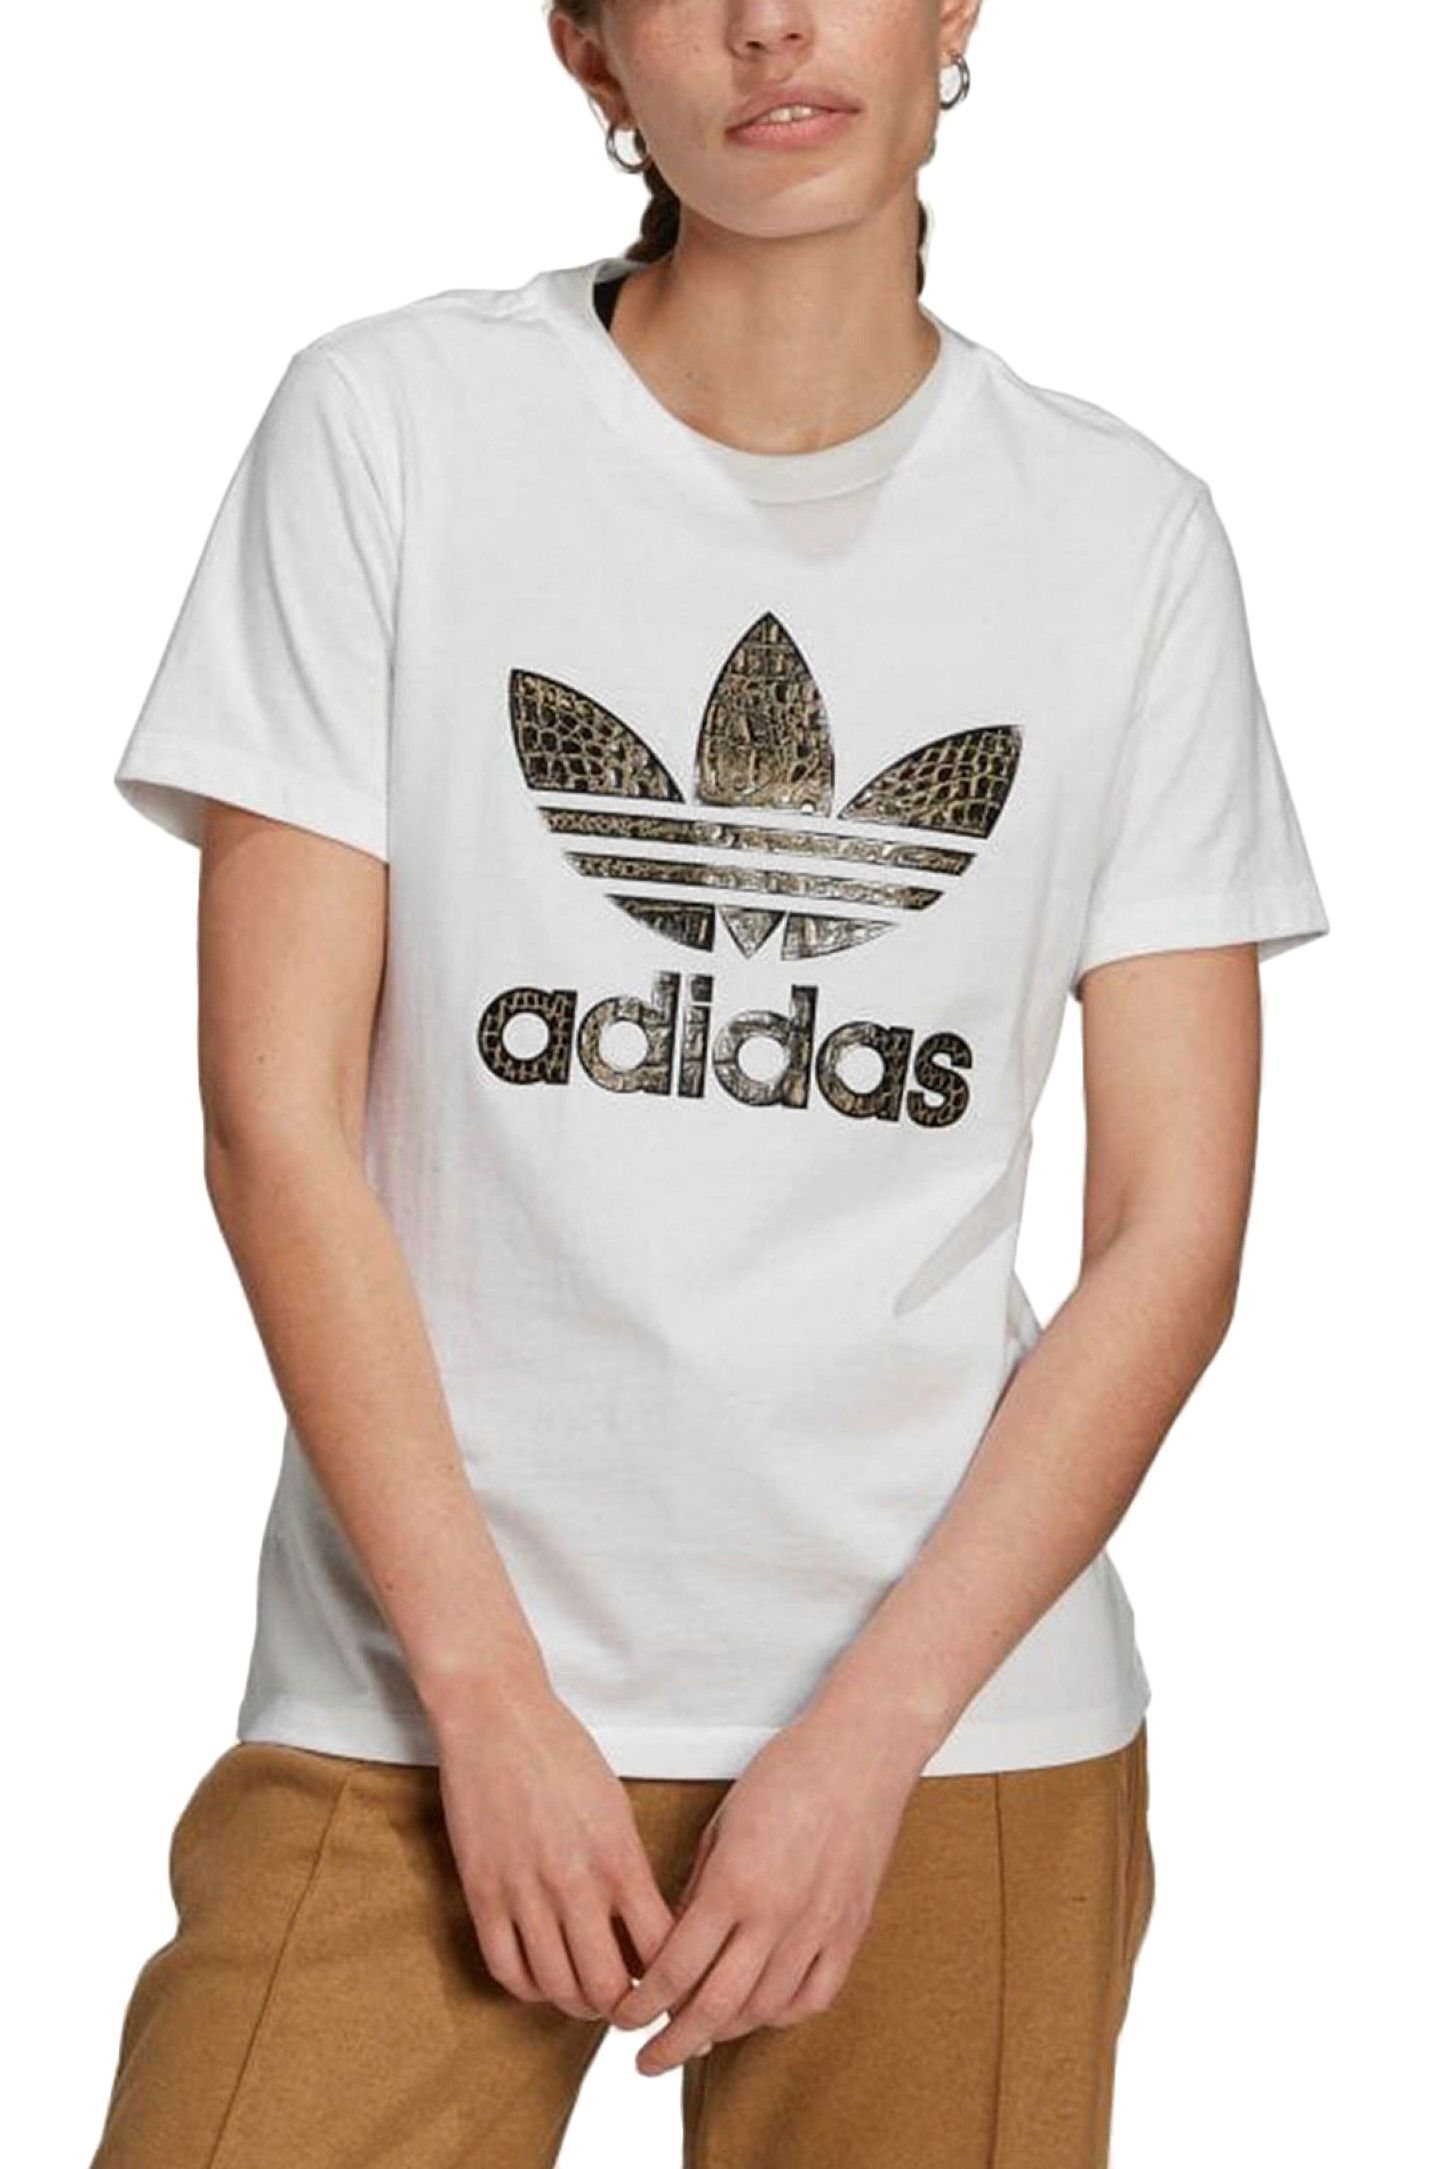 Adidas T-Shirt TEE White